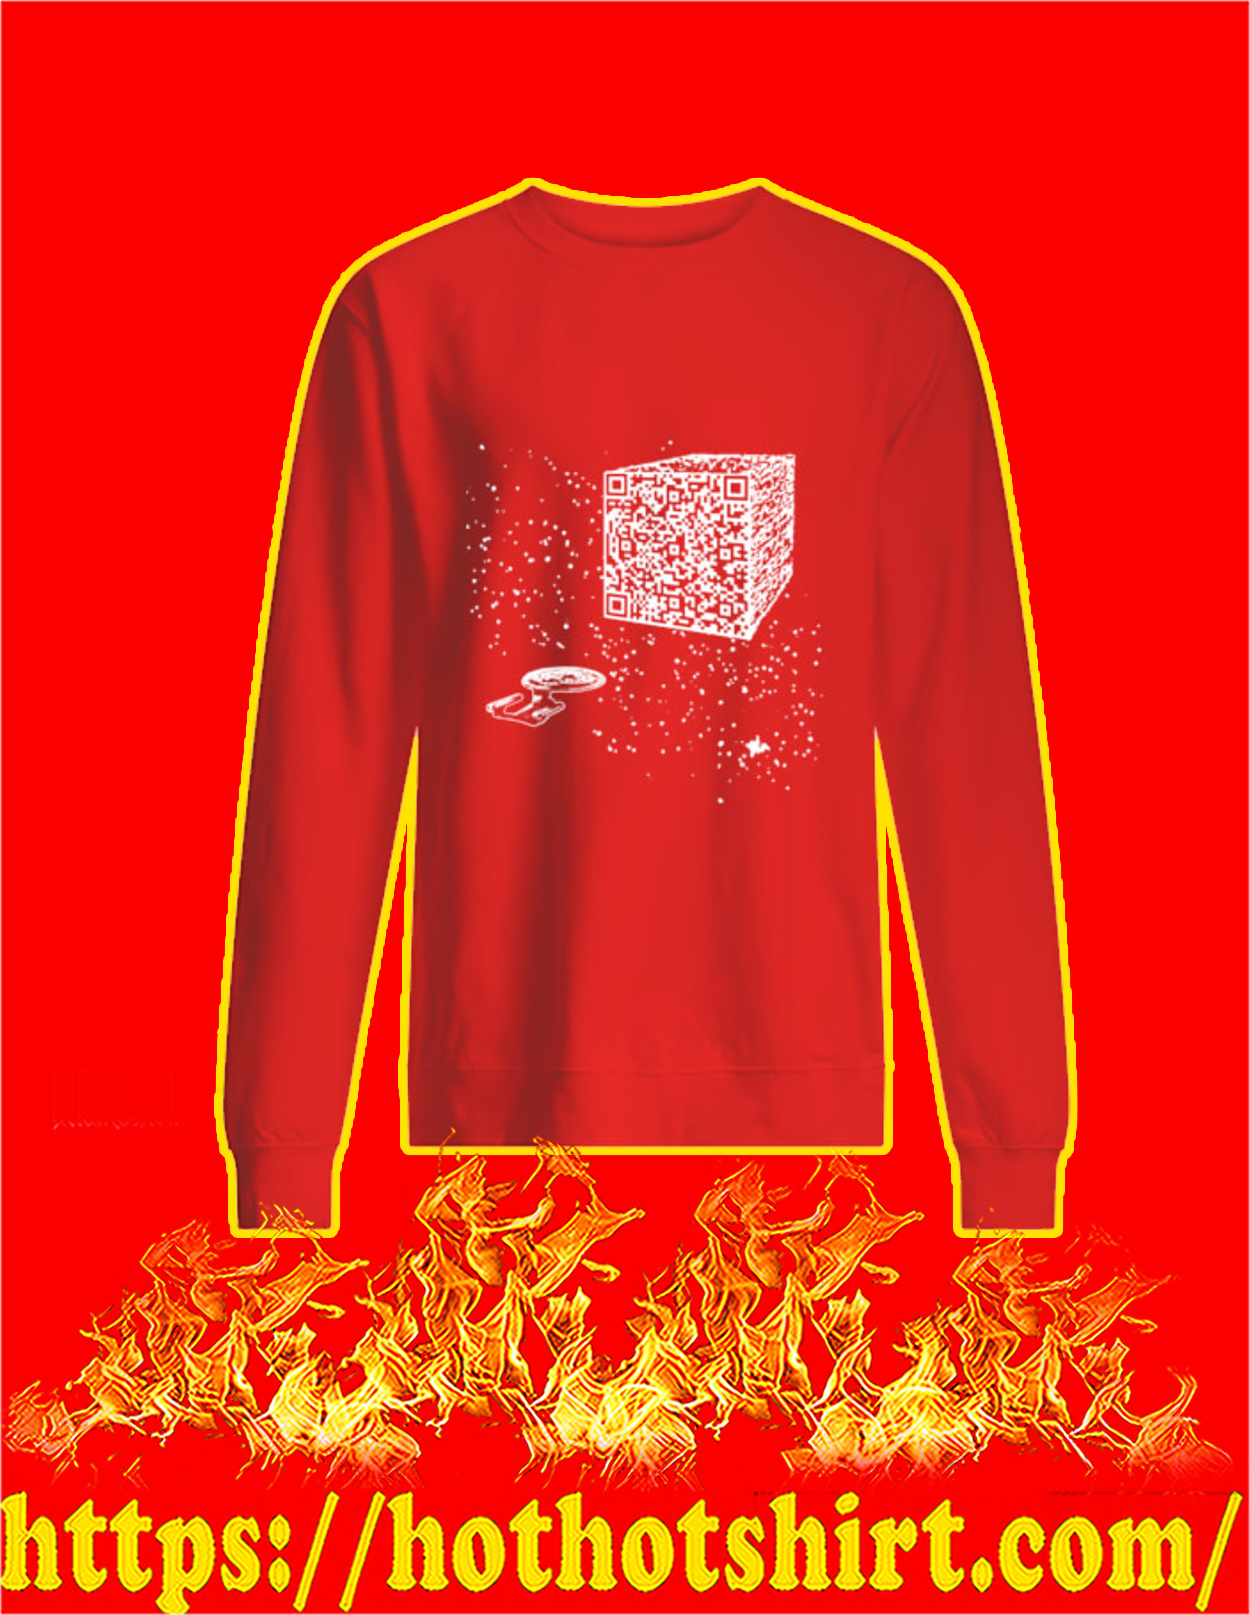 We are the borg cube QR code sweatshirt